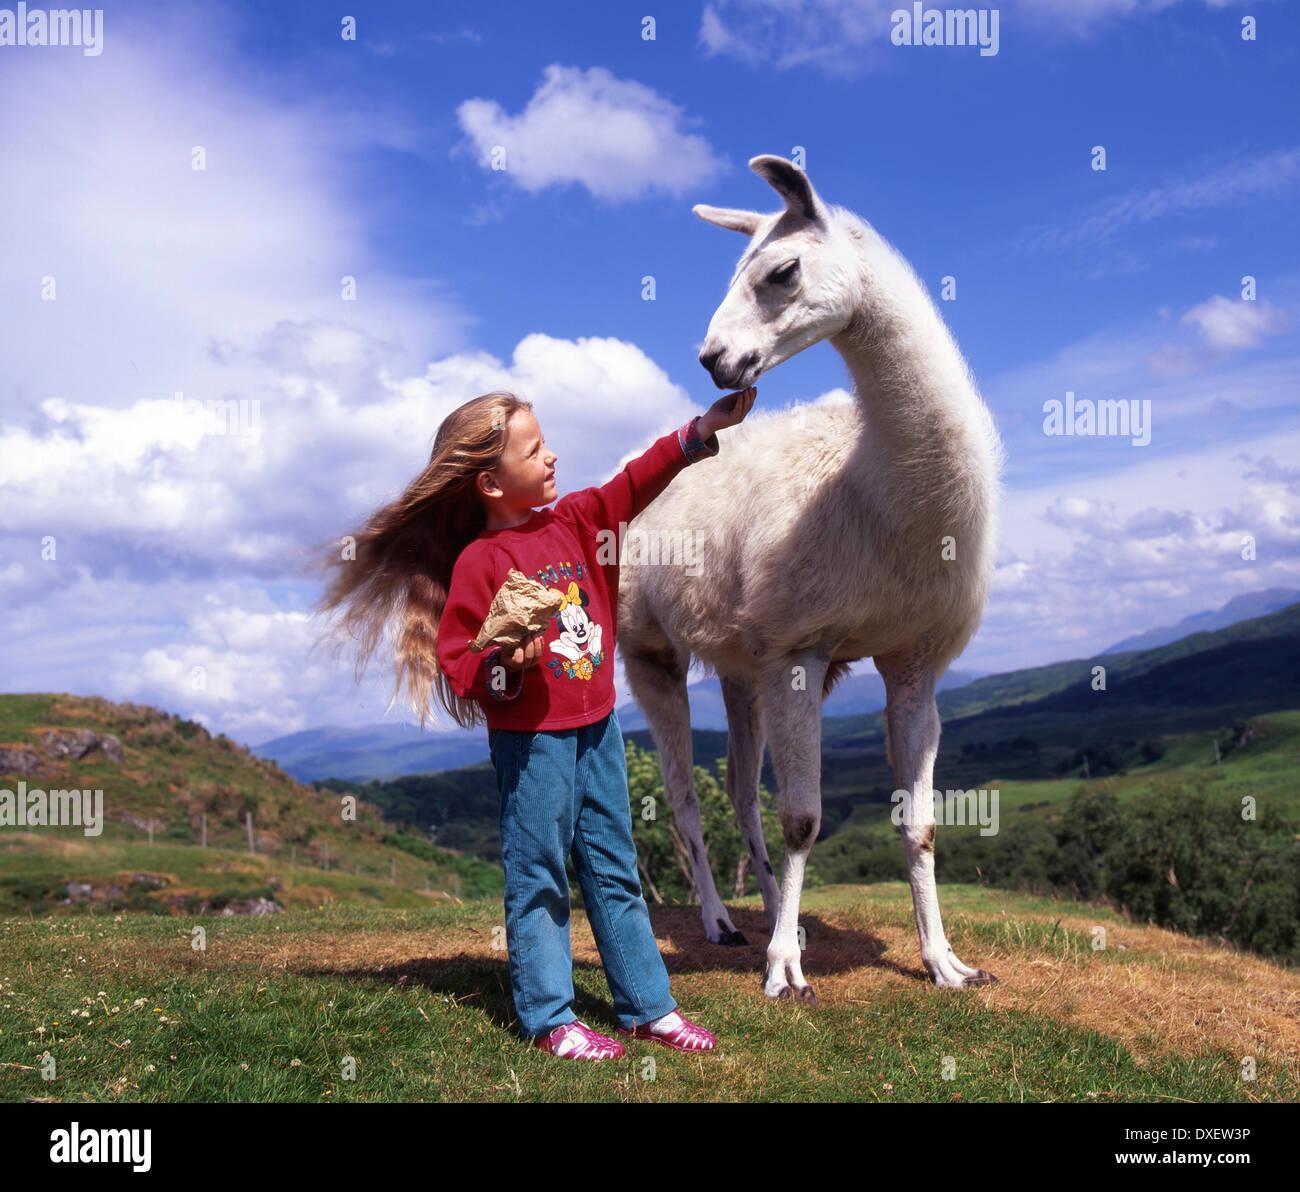 Girl feeds lama at rare breeds park Argyll - Stock Image